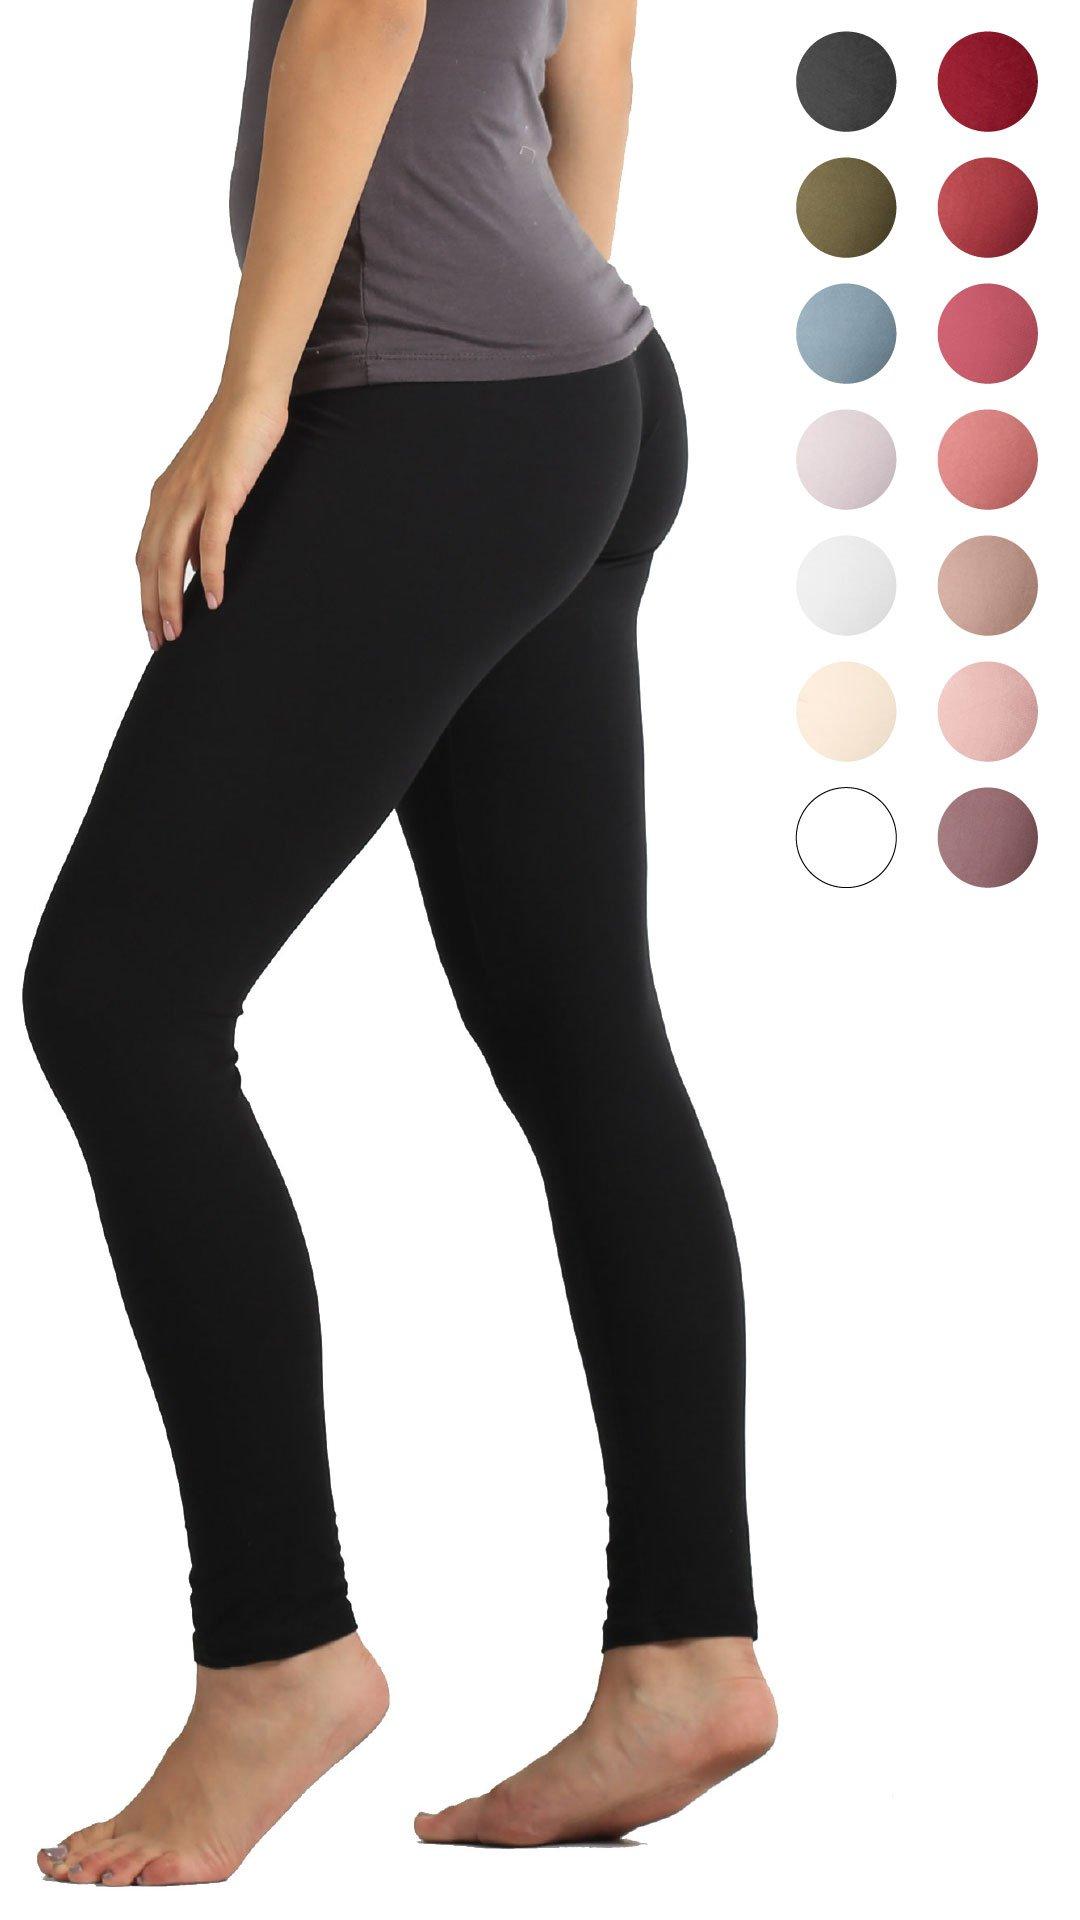 Premium Ultra Soft High Waist Leggings for Women - Black - Large/X-Large